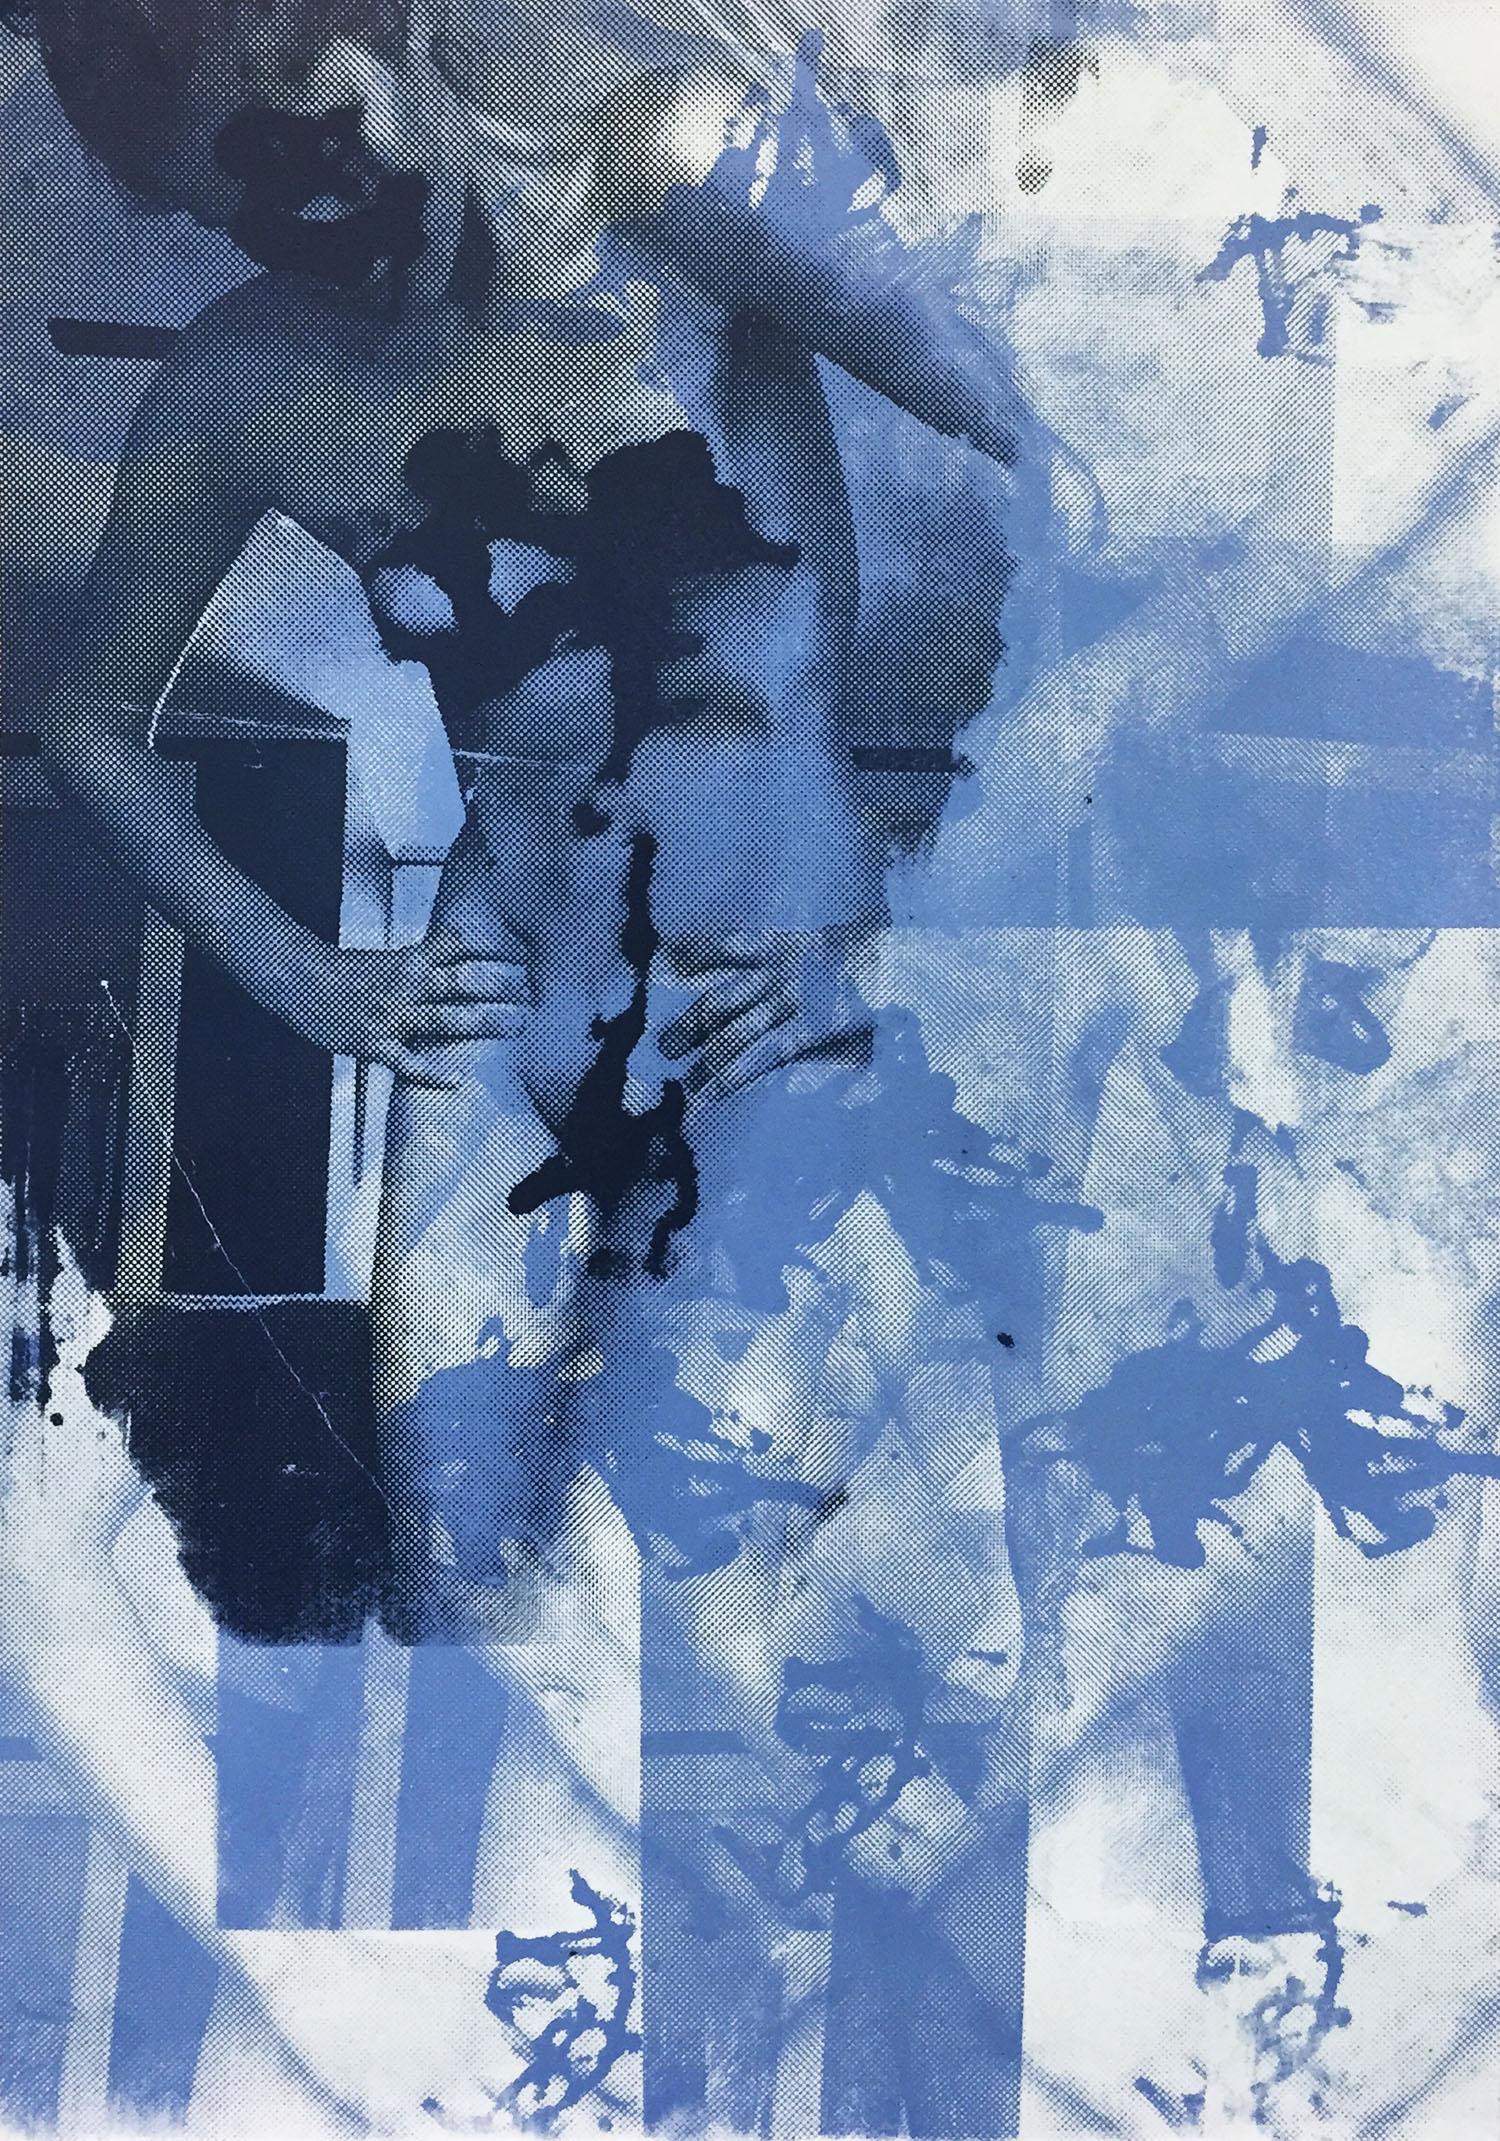 "Cold & Unresponsive S creenprint, 21x14.5"", 2015"